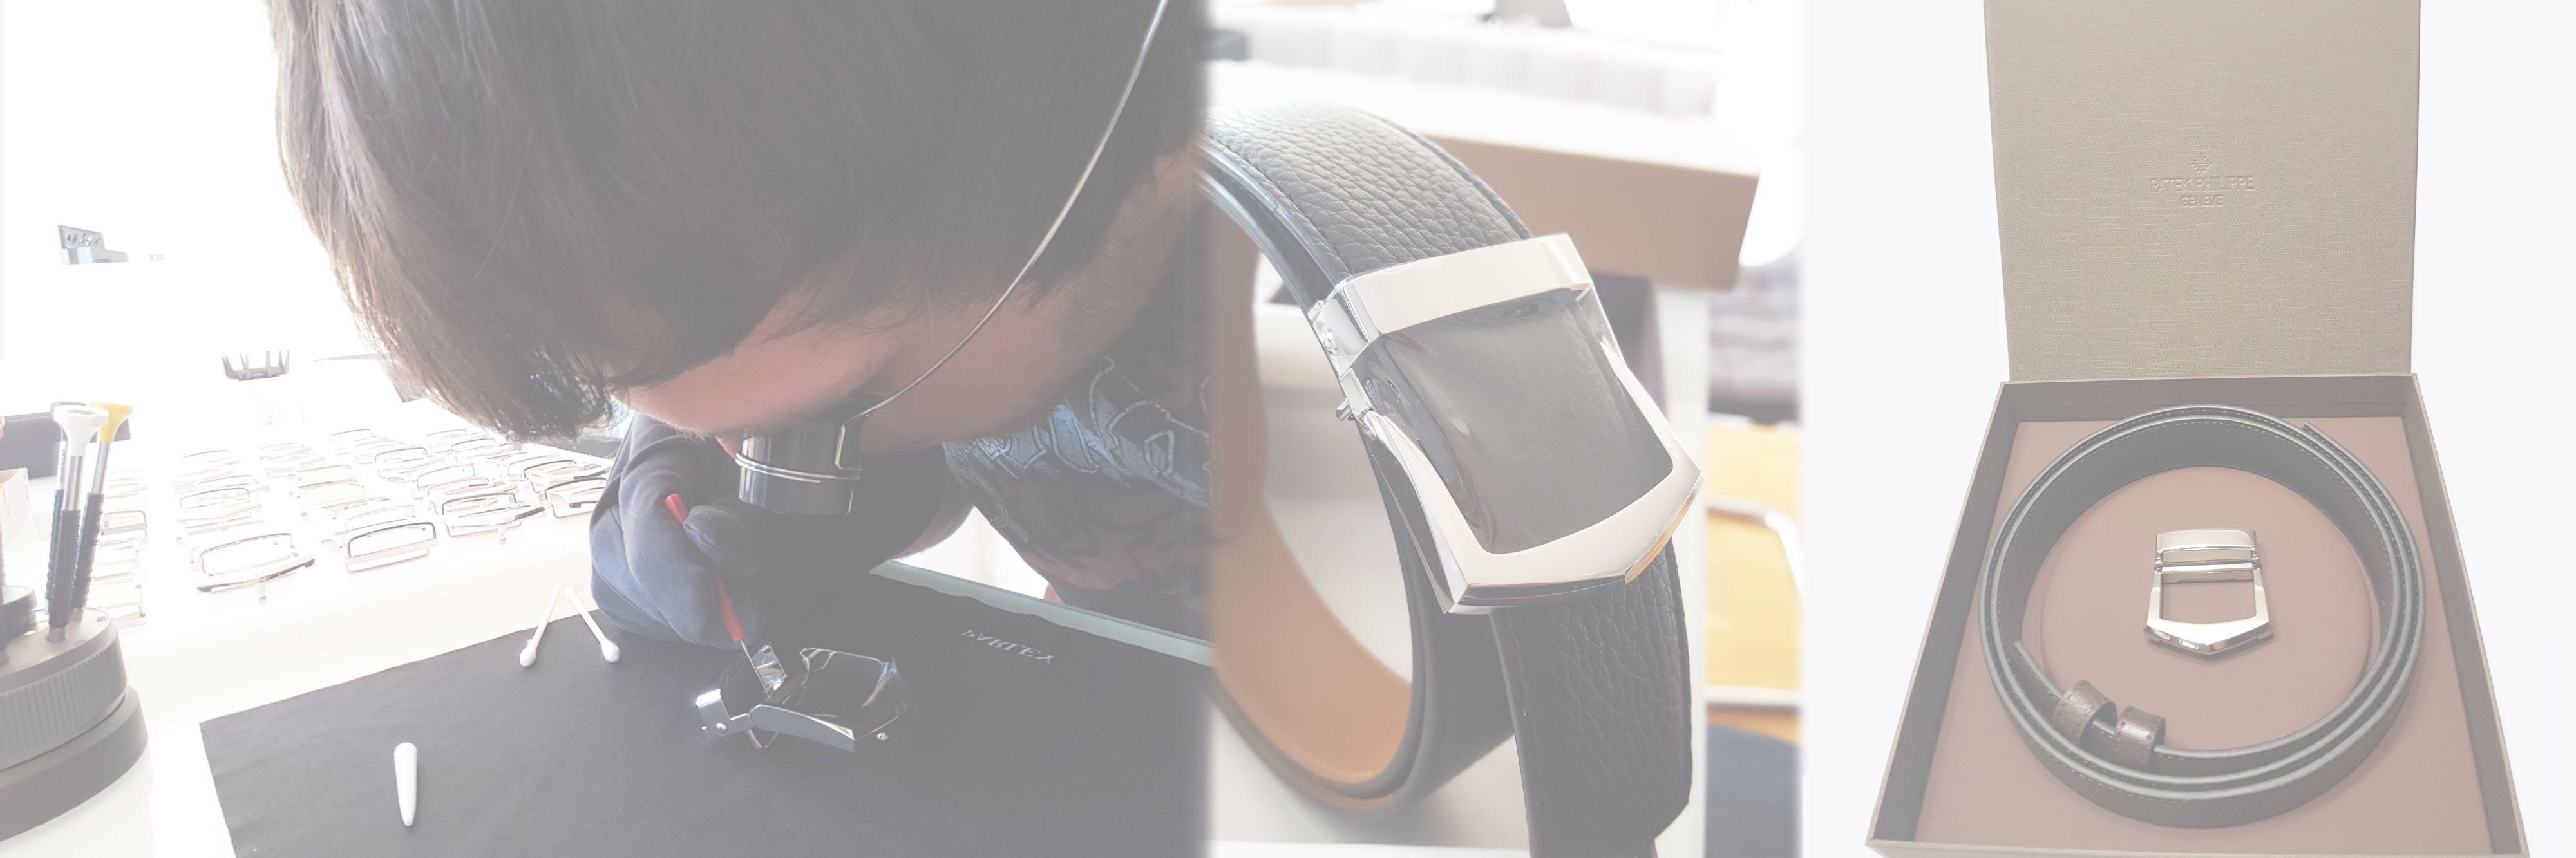 Belt Buckle Manufacturer Switzerland for Customer Gifts